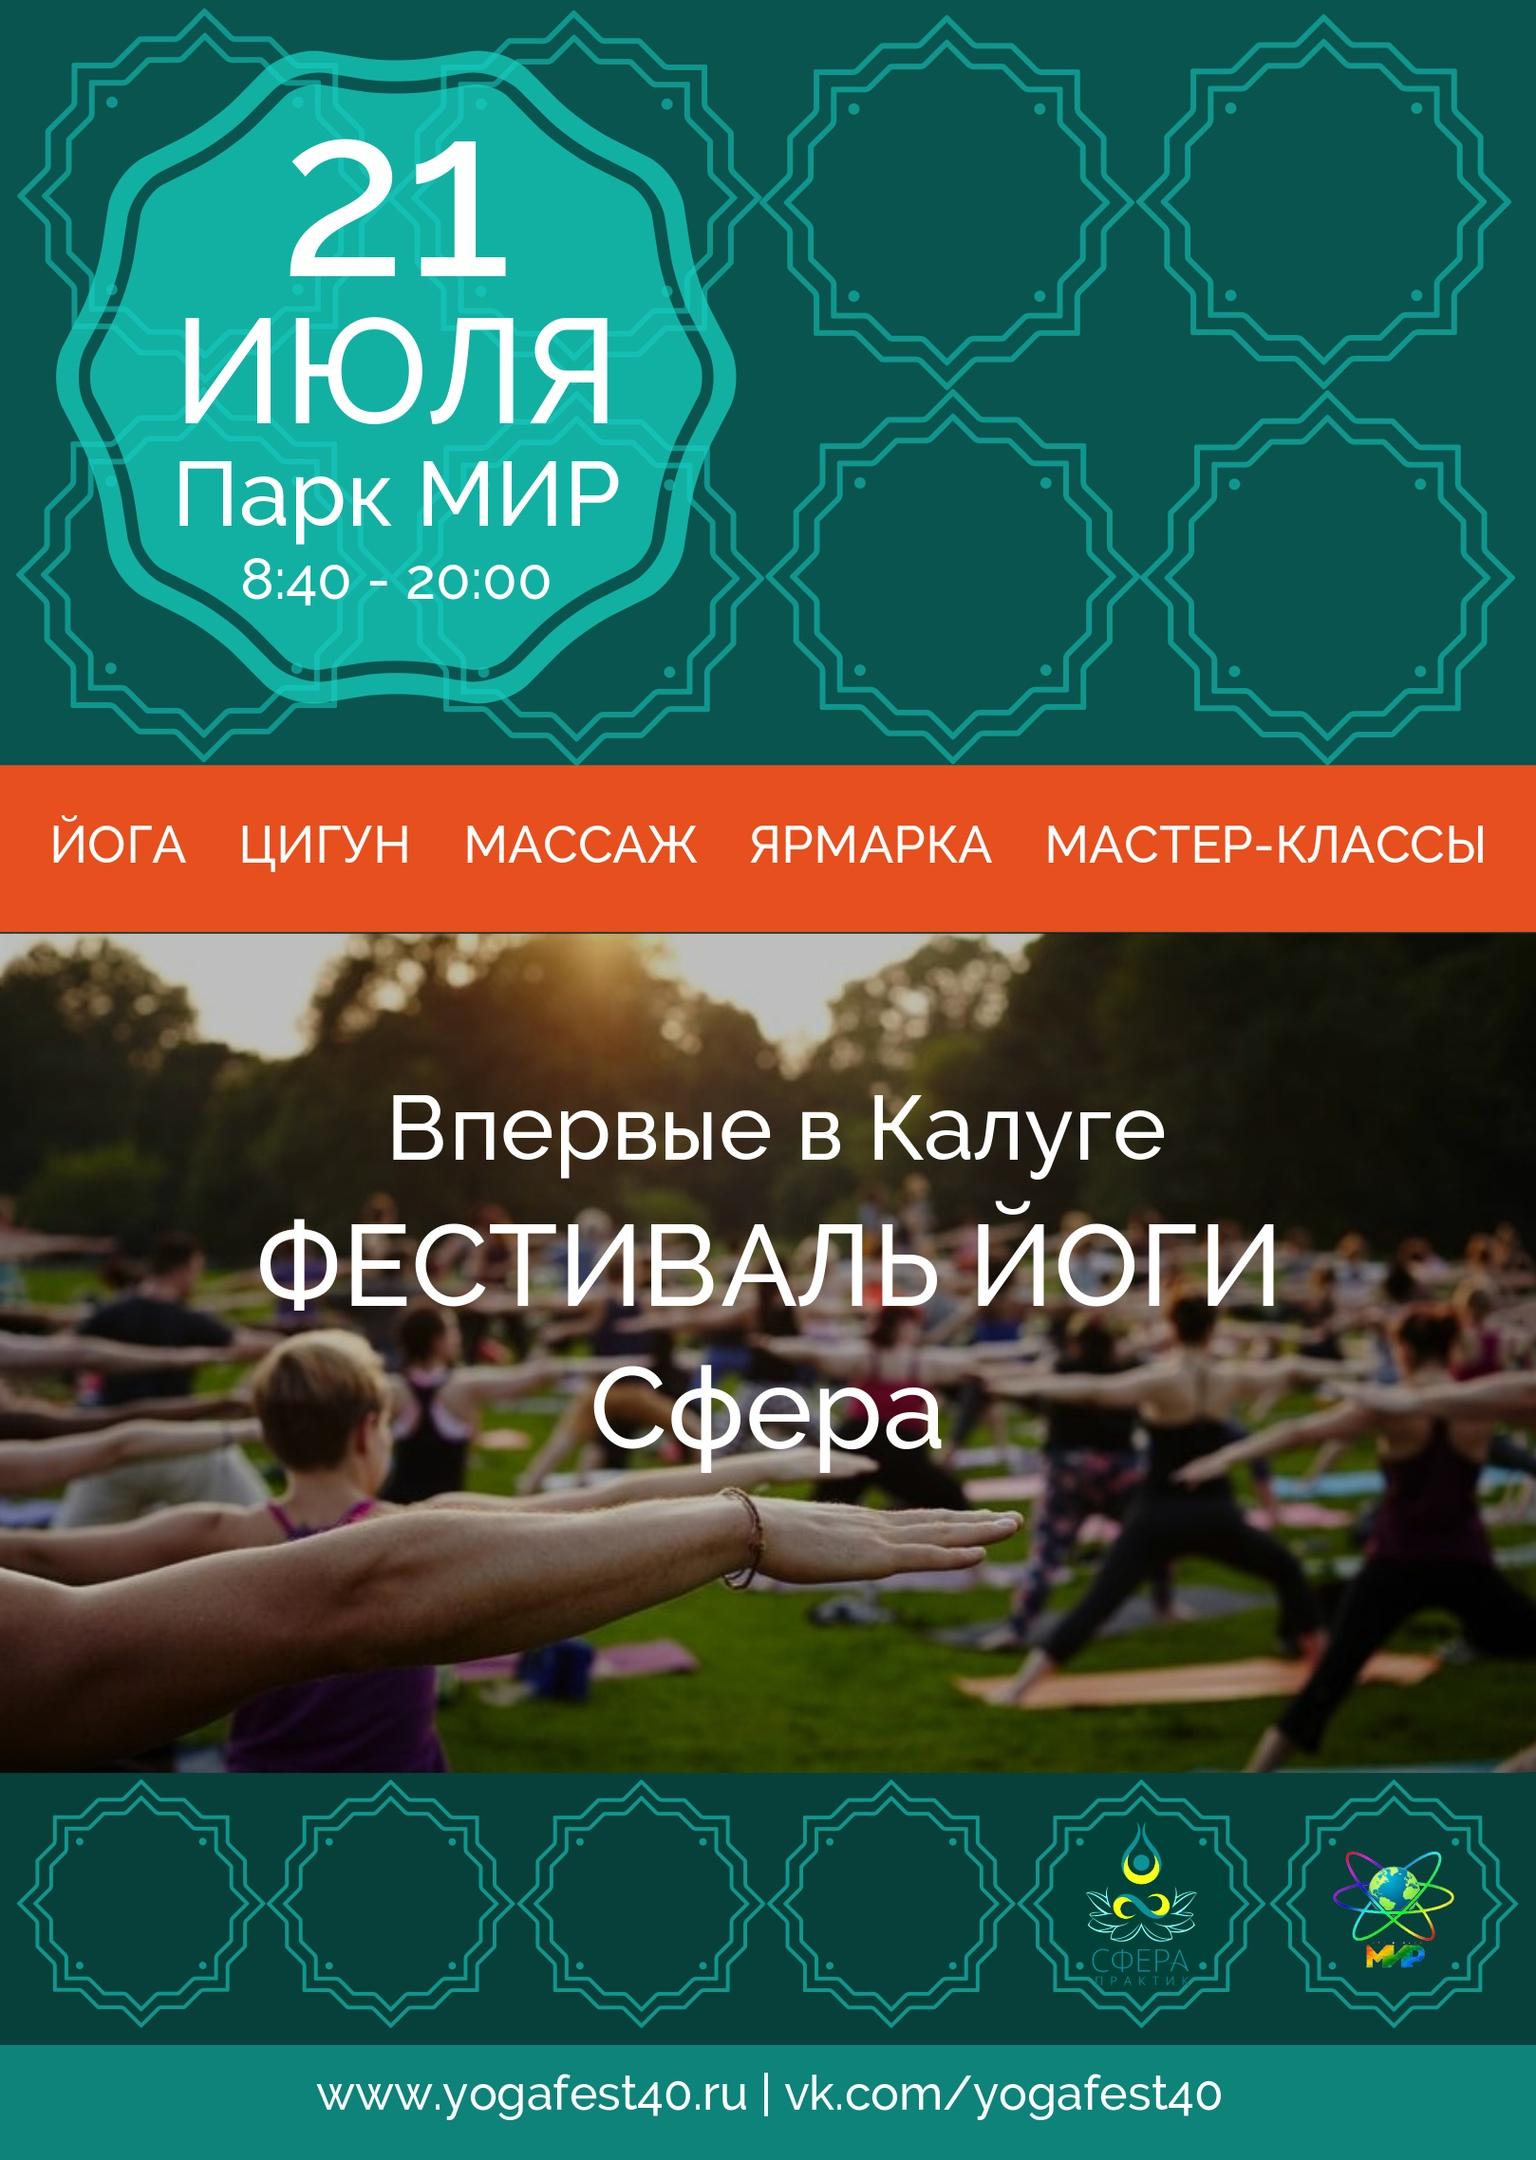 festival-jogi-sfera